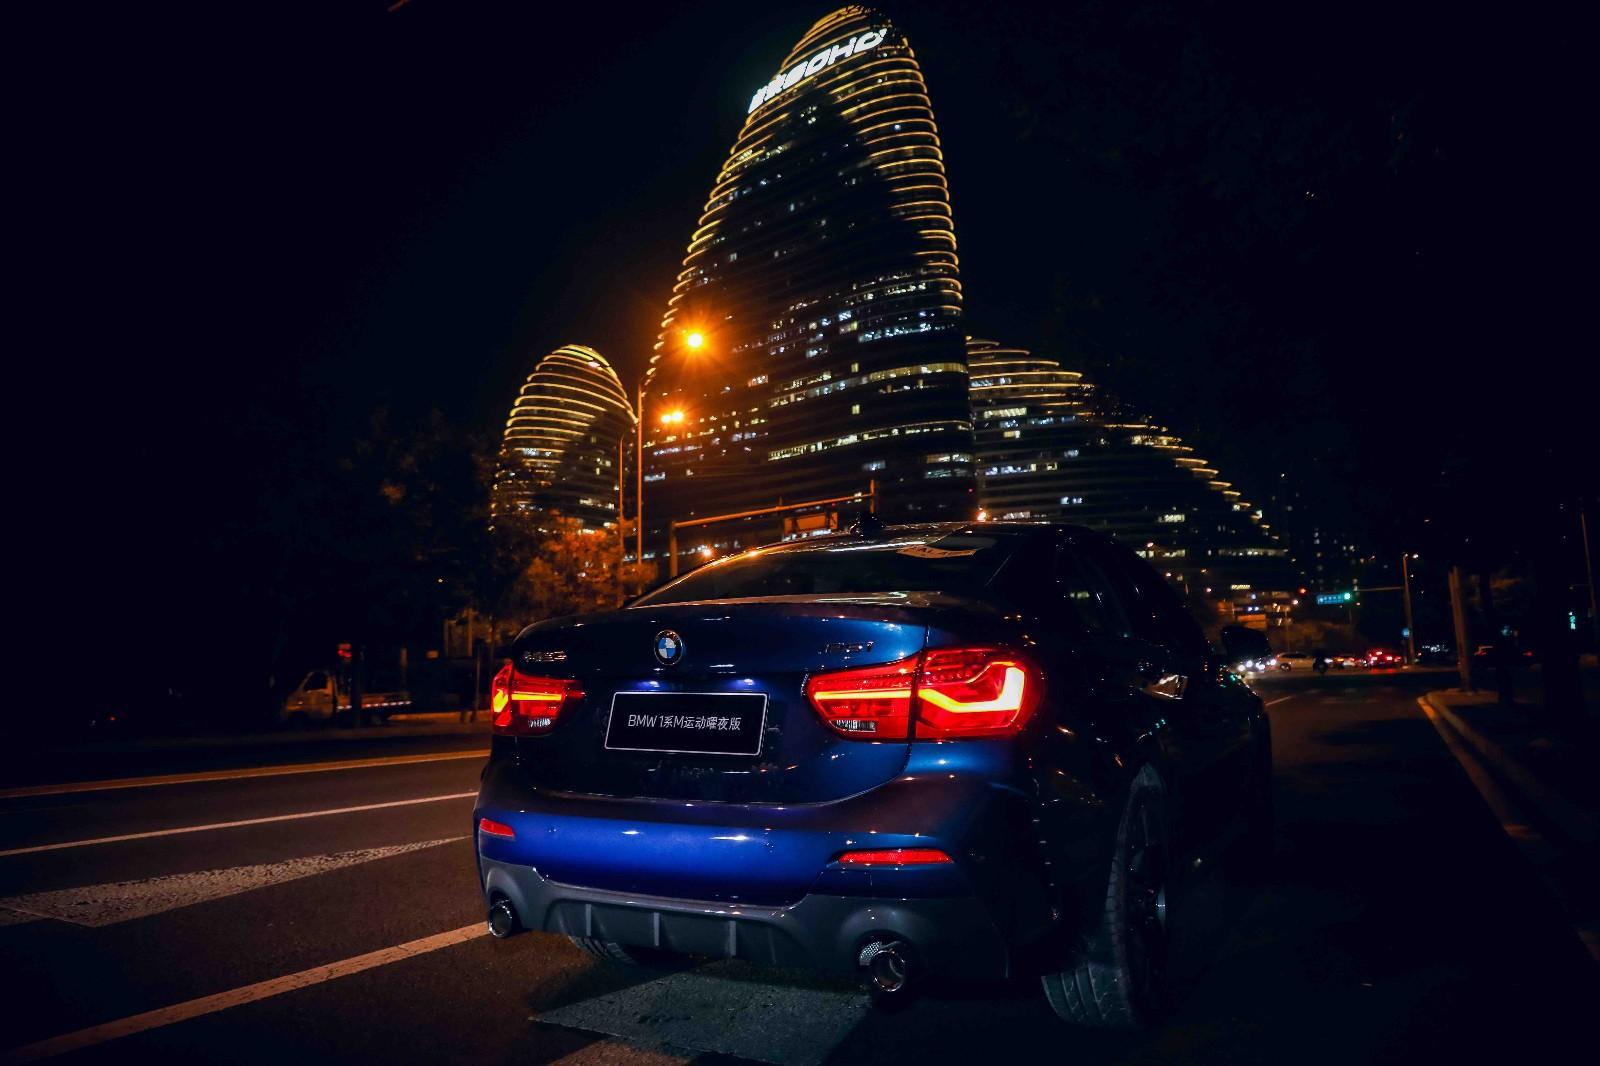 "04.BMW 1系M运动曜夜版 ""北京1夜""媒体试驾.jpg"